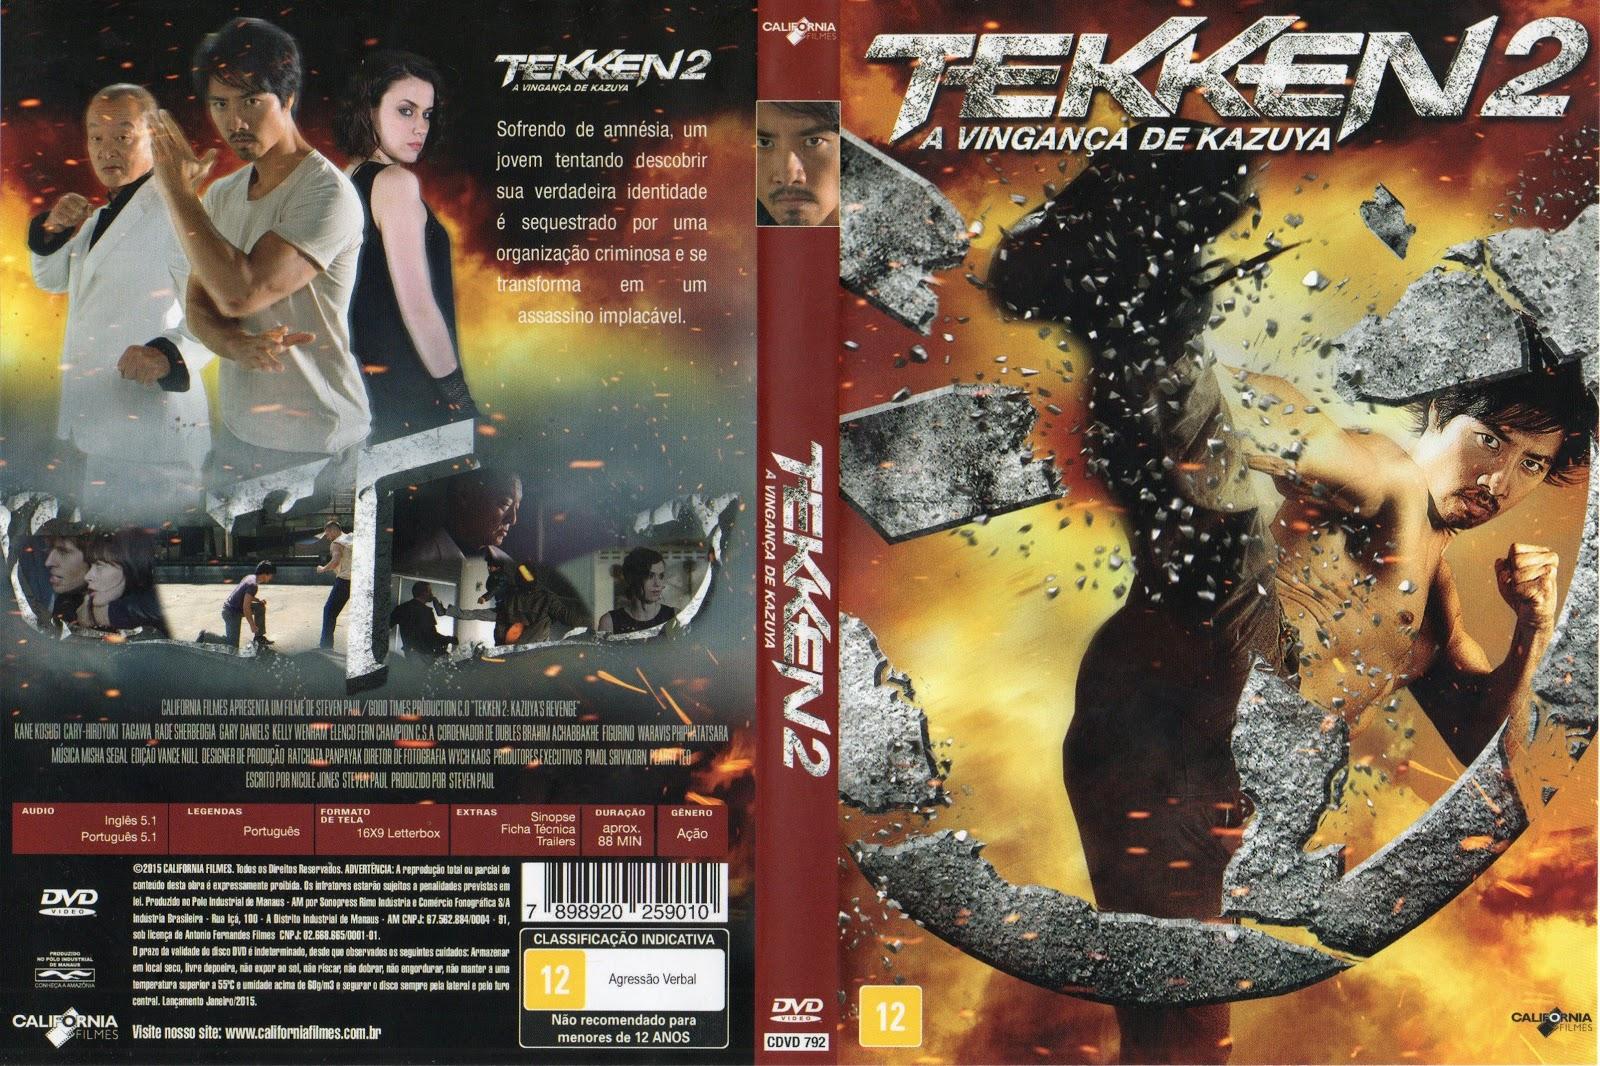 Capa DVD Tekken 2 A Vingança De Kazuya